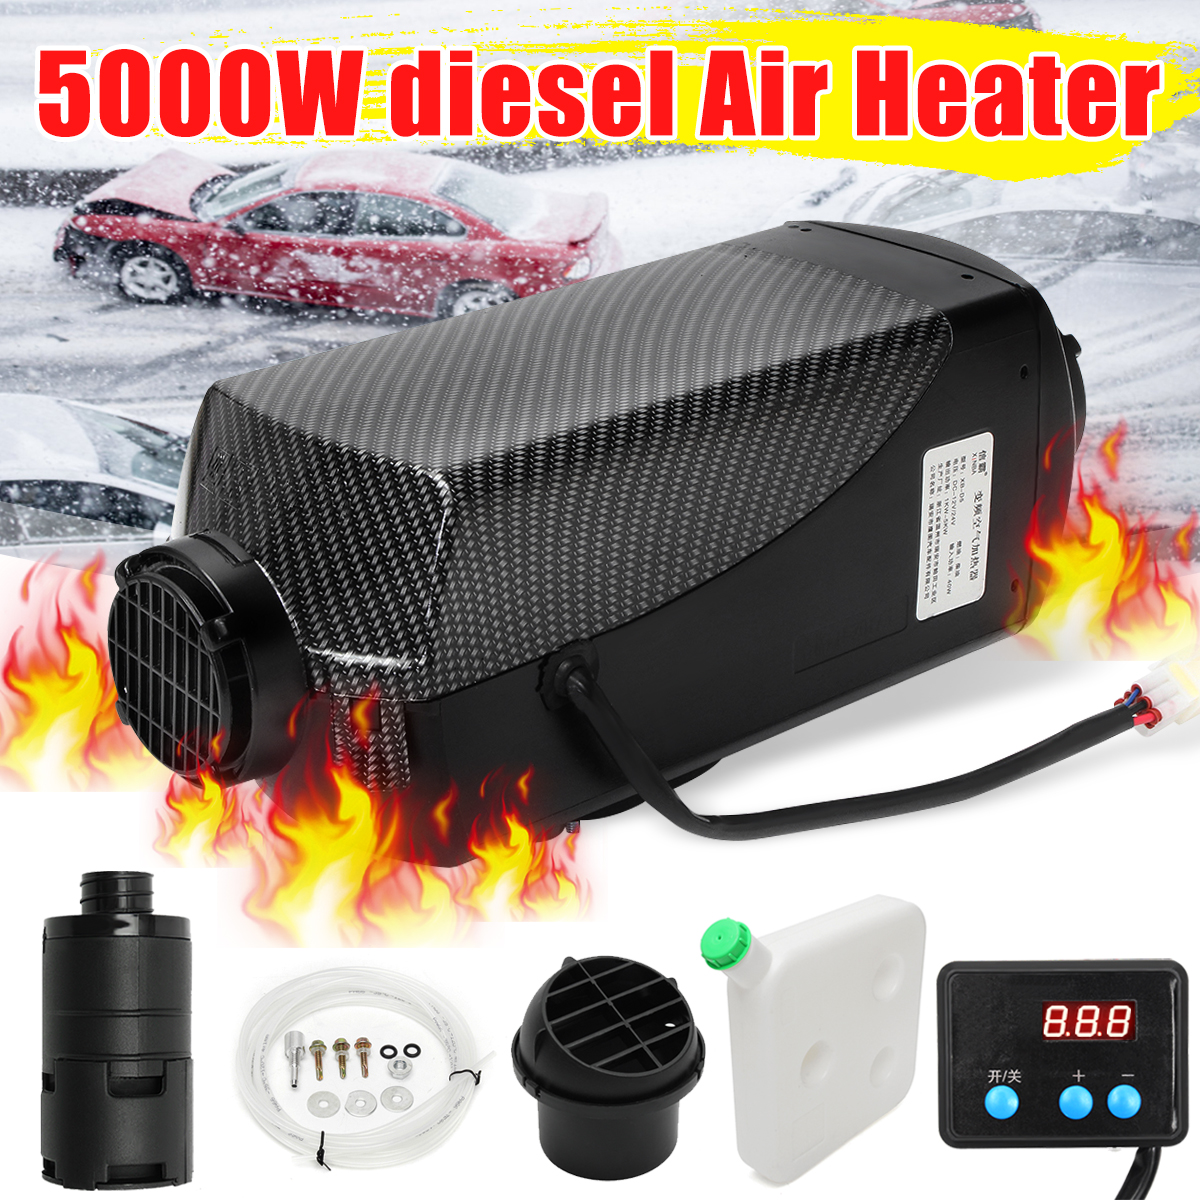 5KW 24V Car Heater Air Diesel Heater Car Warmer Heating Machine with Digital Display For heater Trailer Motorhome Truck Boat Bus